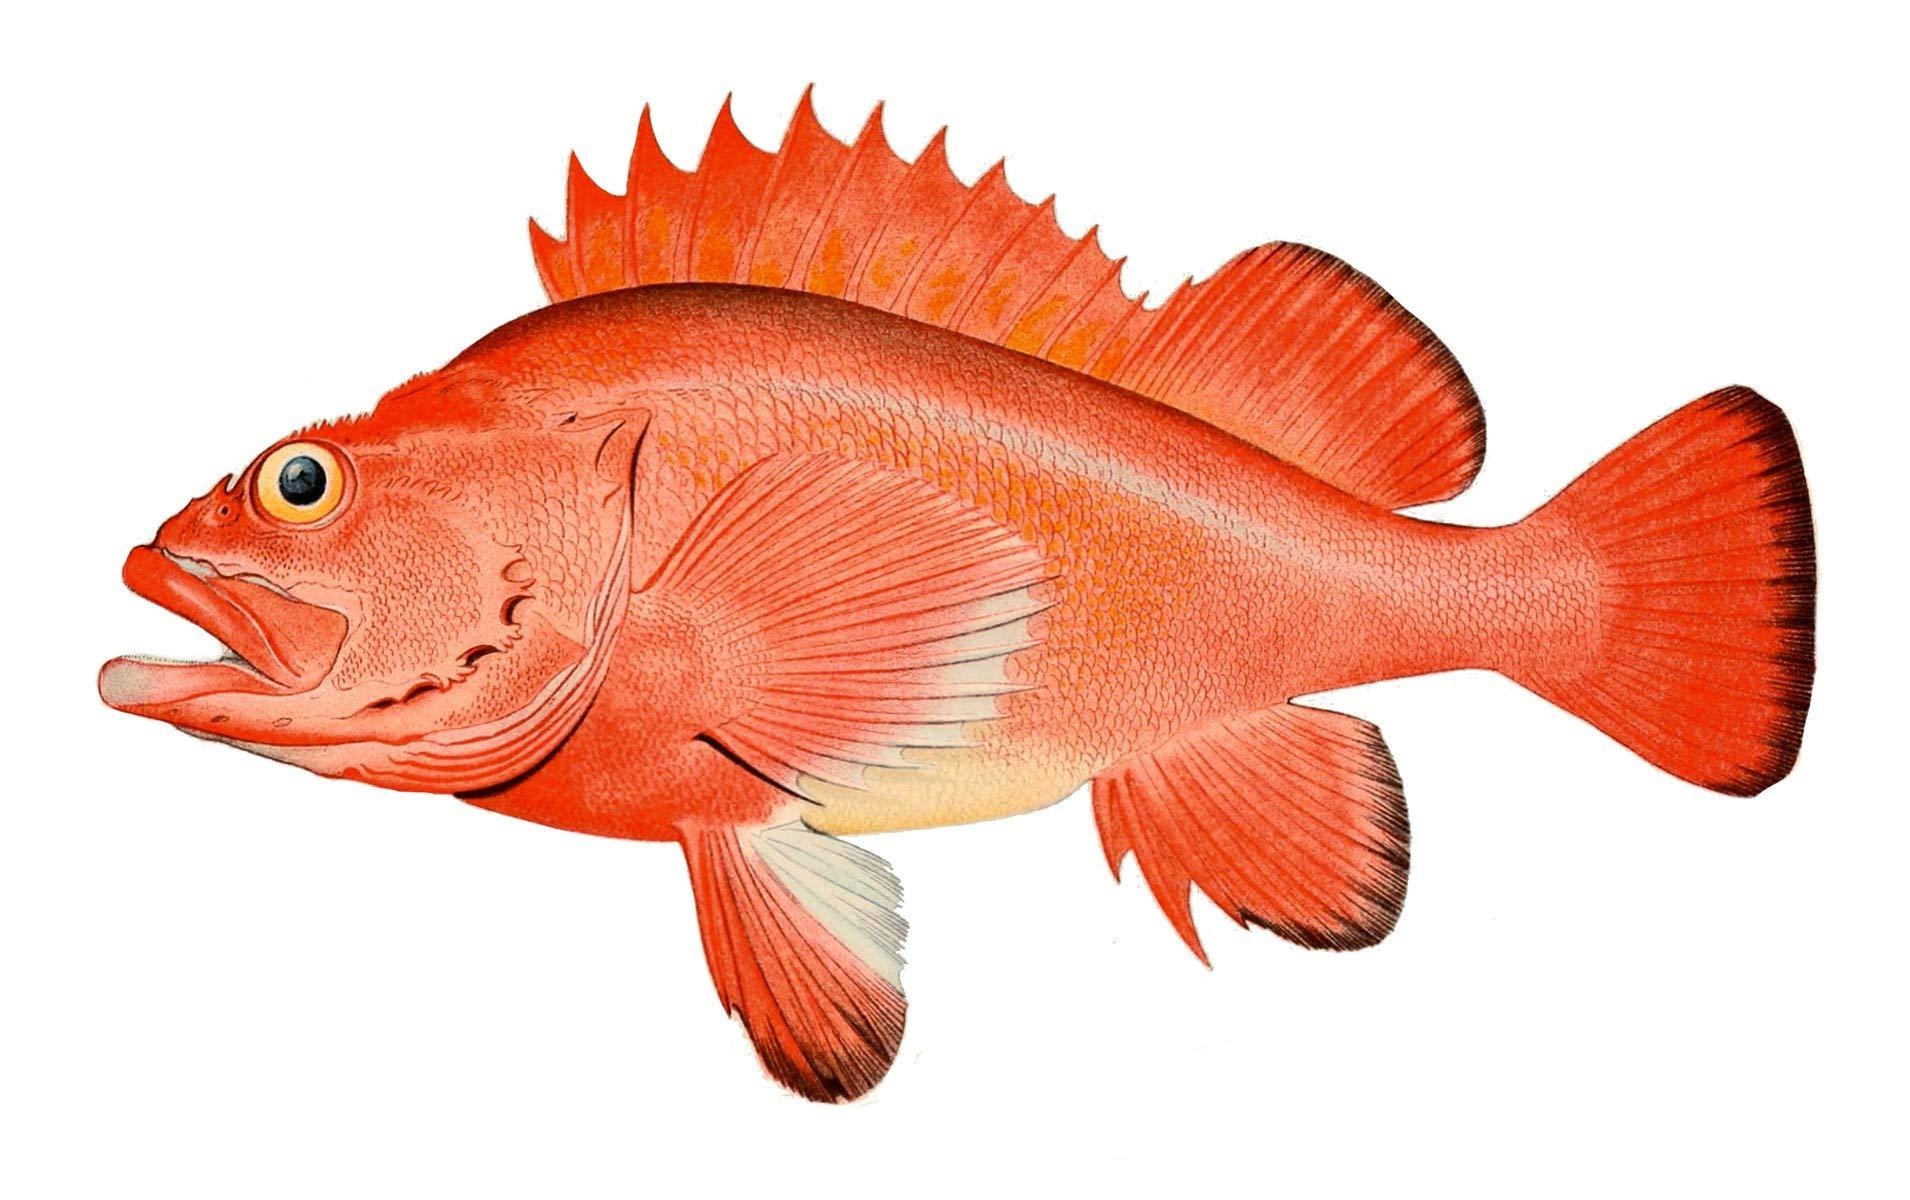 Rockfish - Wild, Alaskan Rockfish Fillets (Skin Off), Harvested in Prince William Sound Alaska, Delivered to Your Door-Step. 10 lbs.